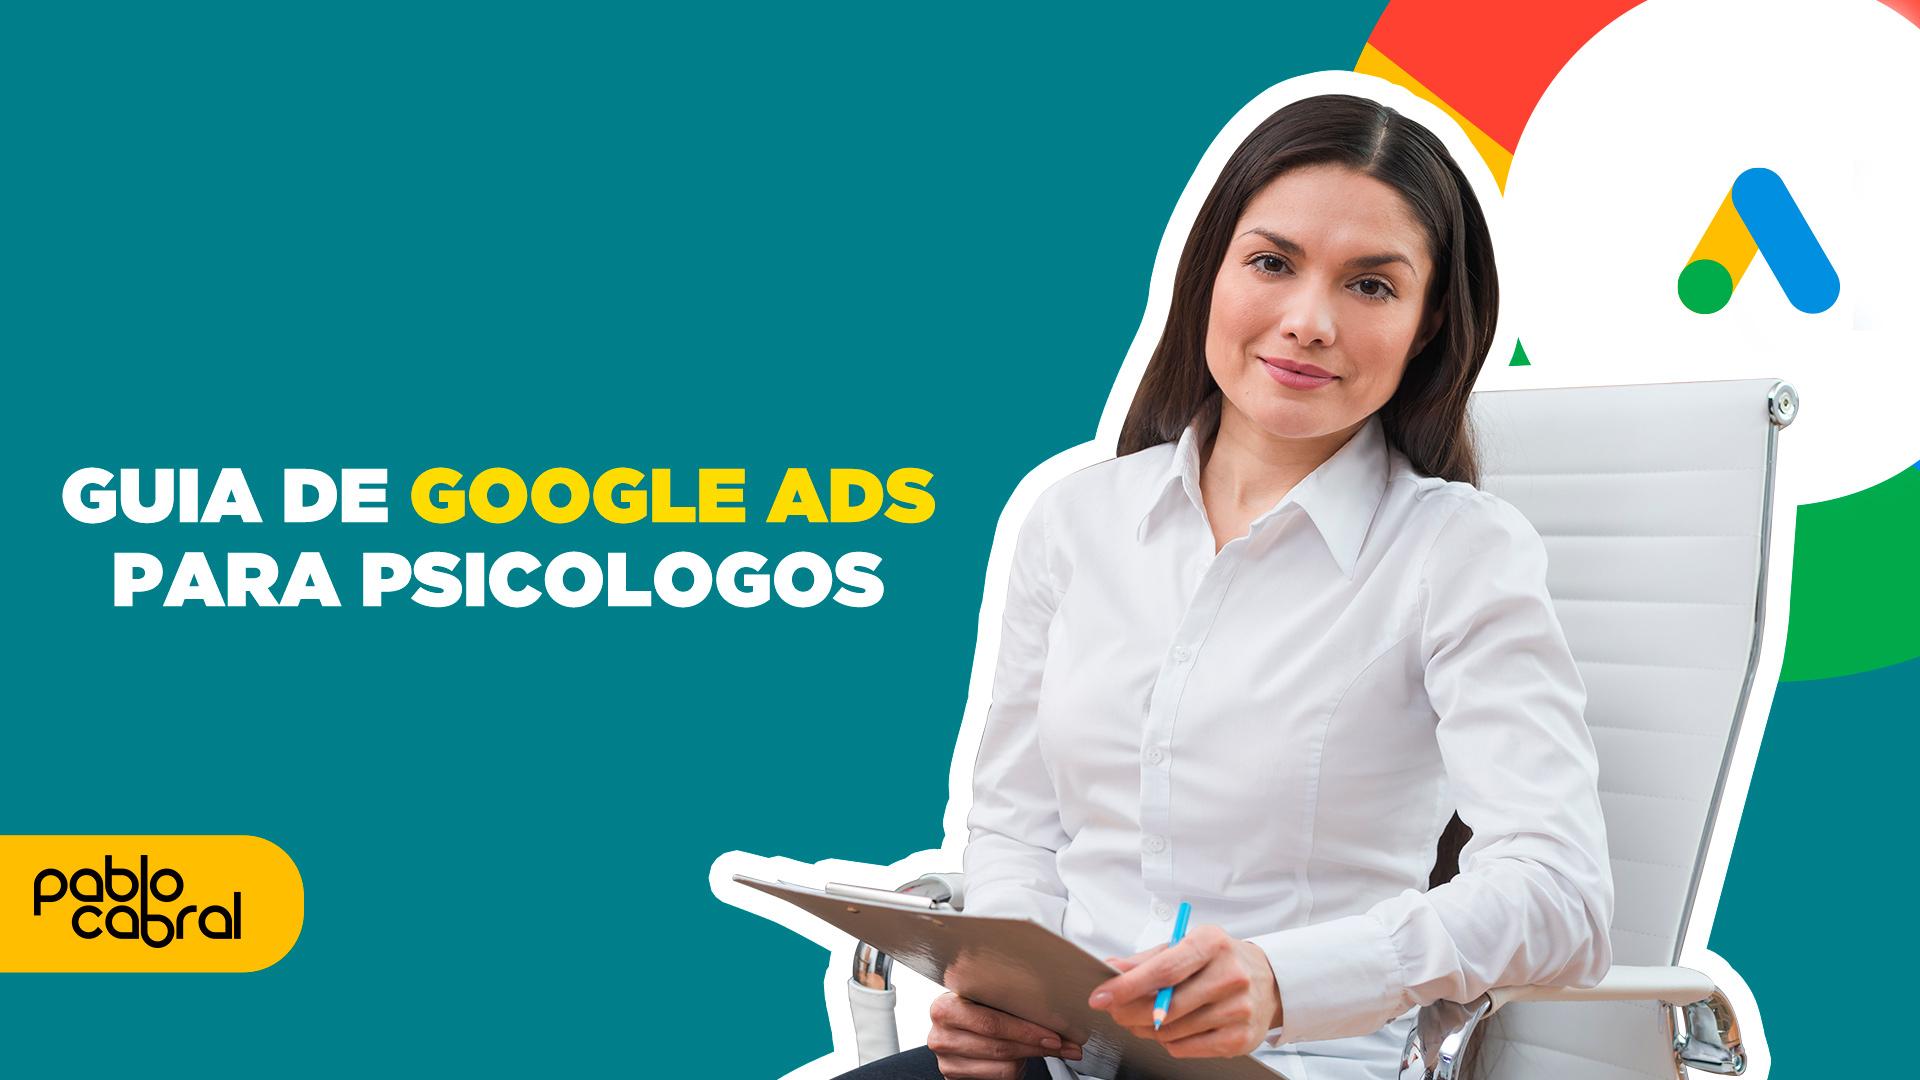 google ads para psicologos